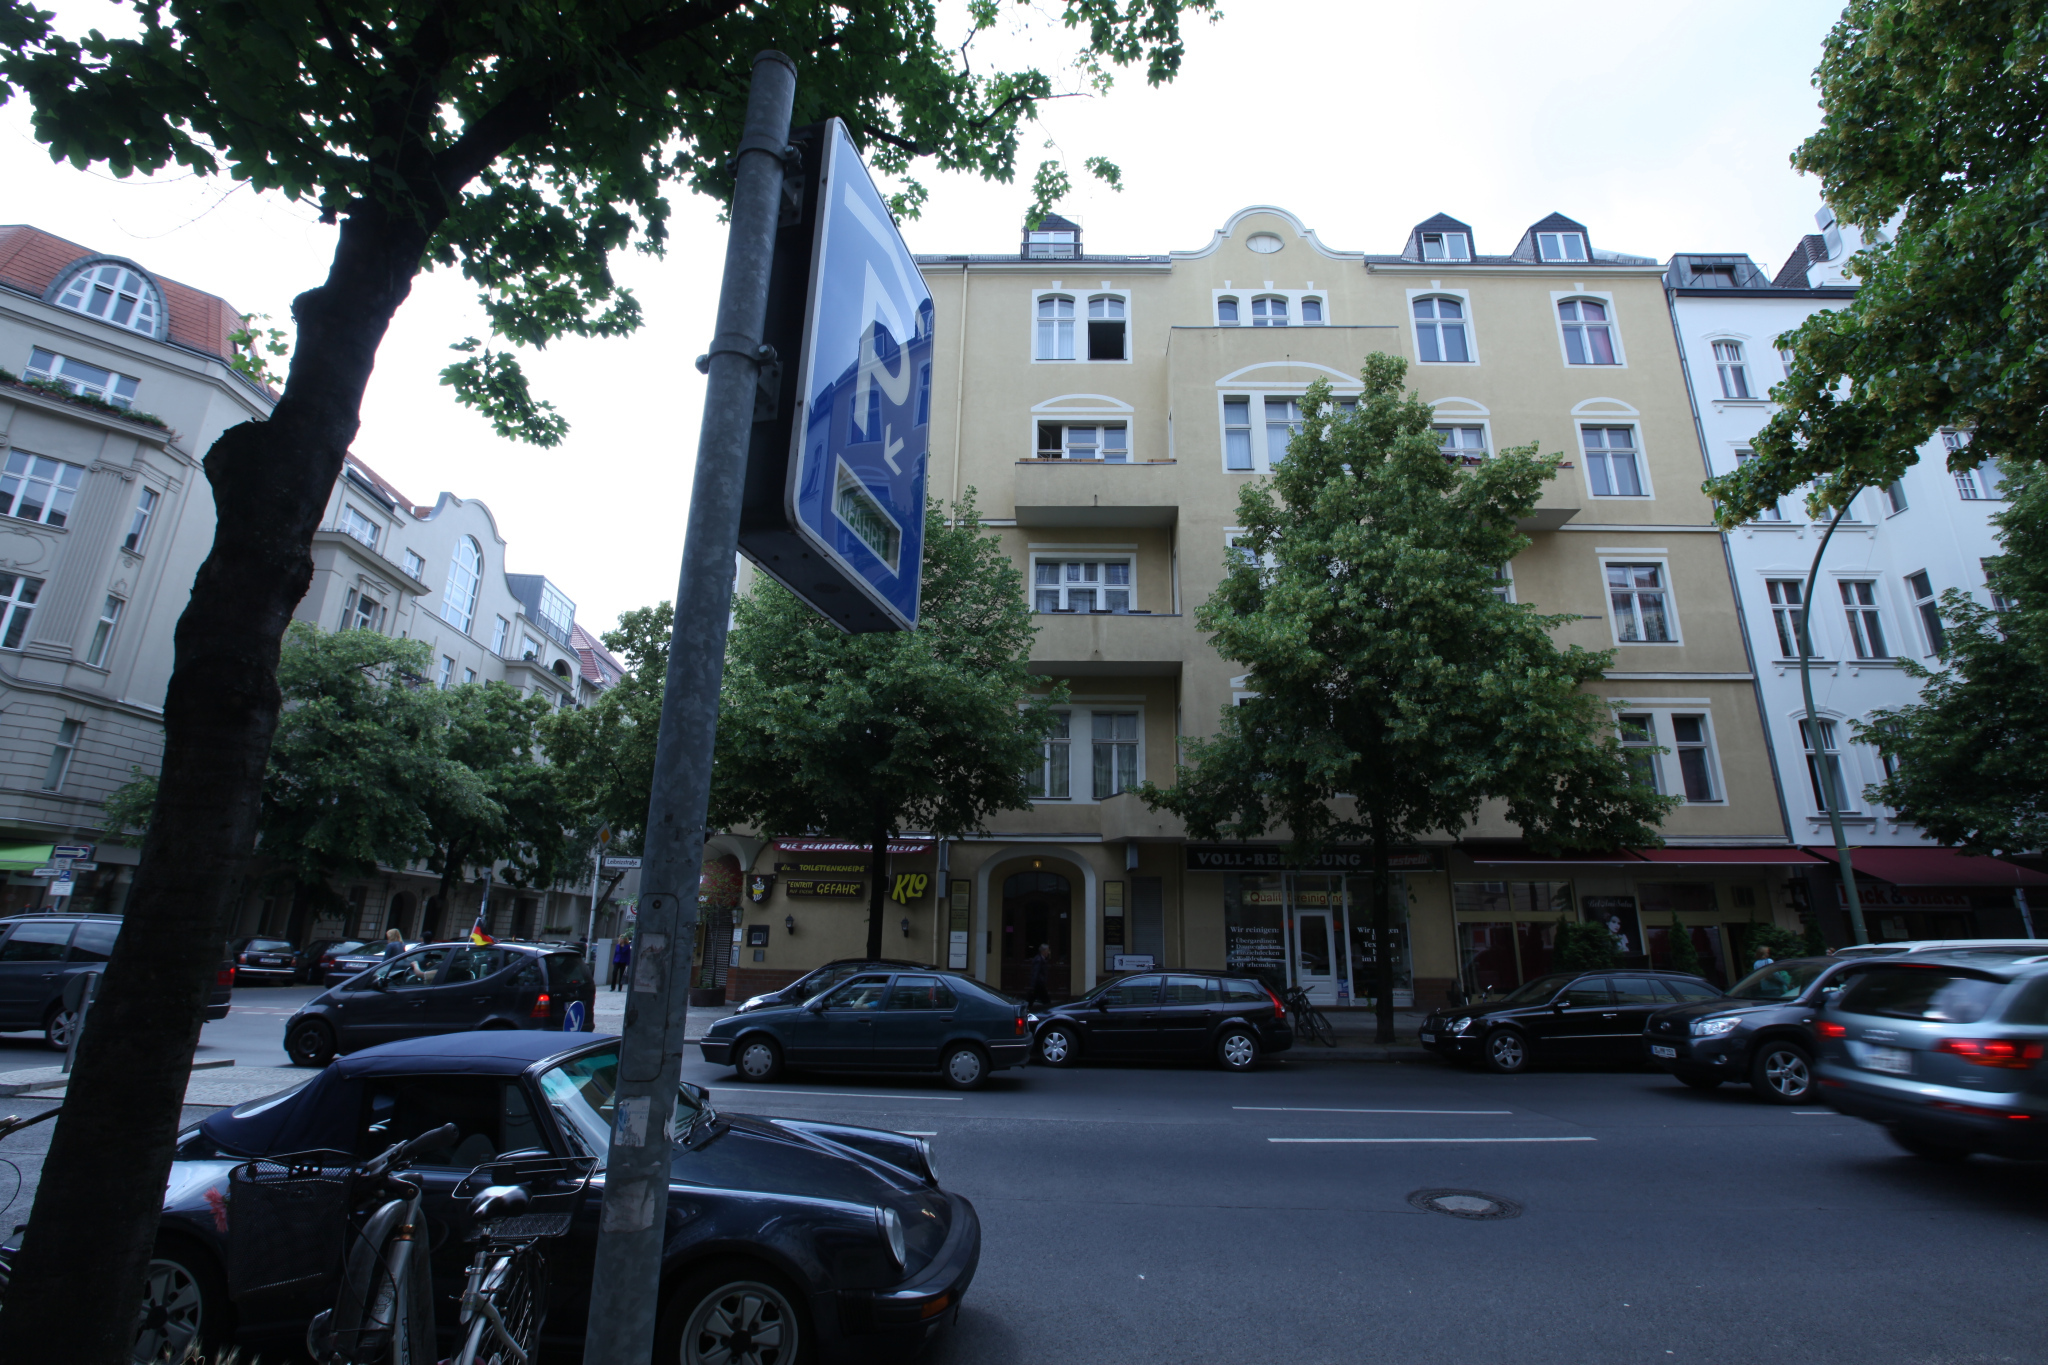 Hotels hotel am d sseldorf platz ofertas especiales for Apartments maison am olivaer platz